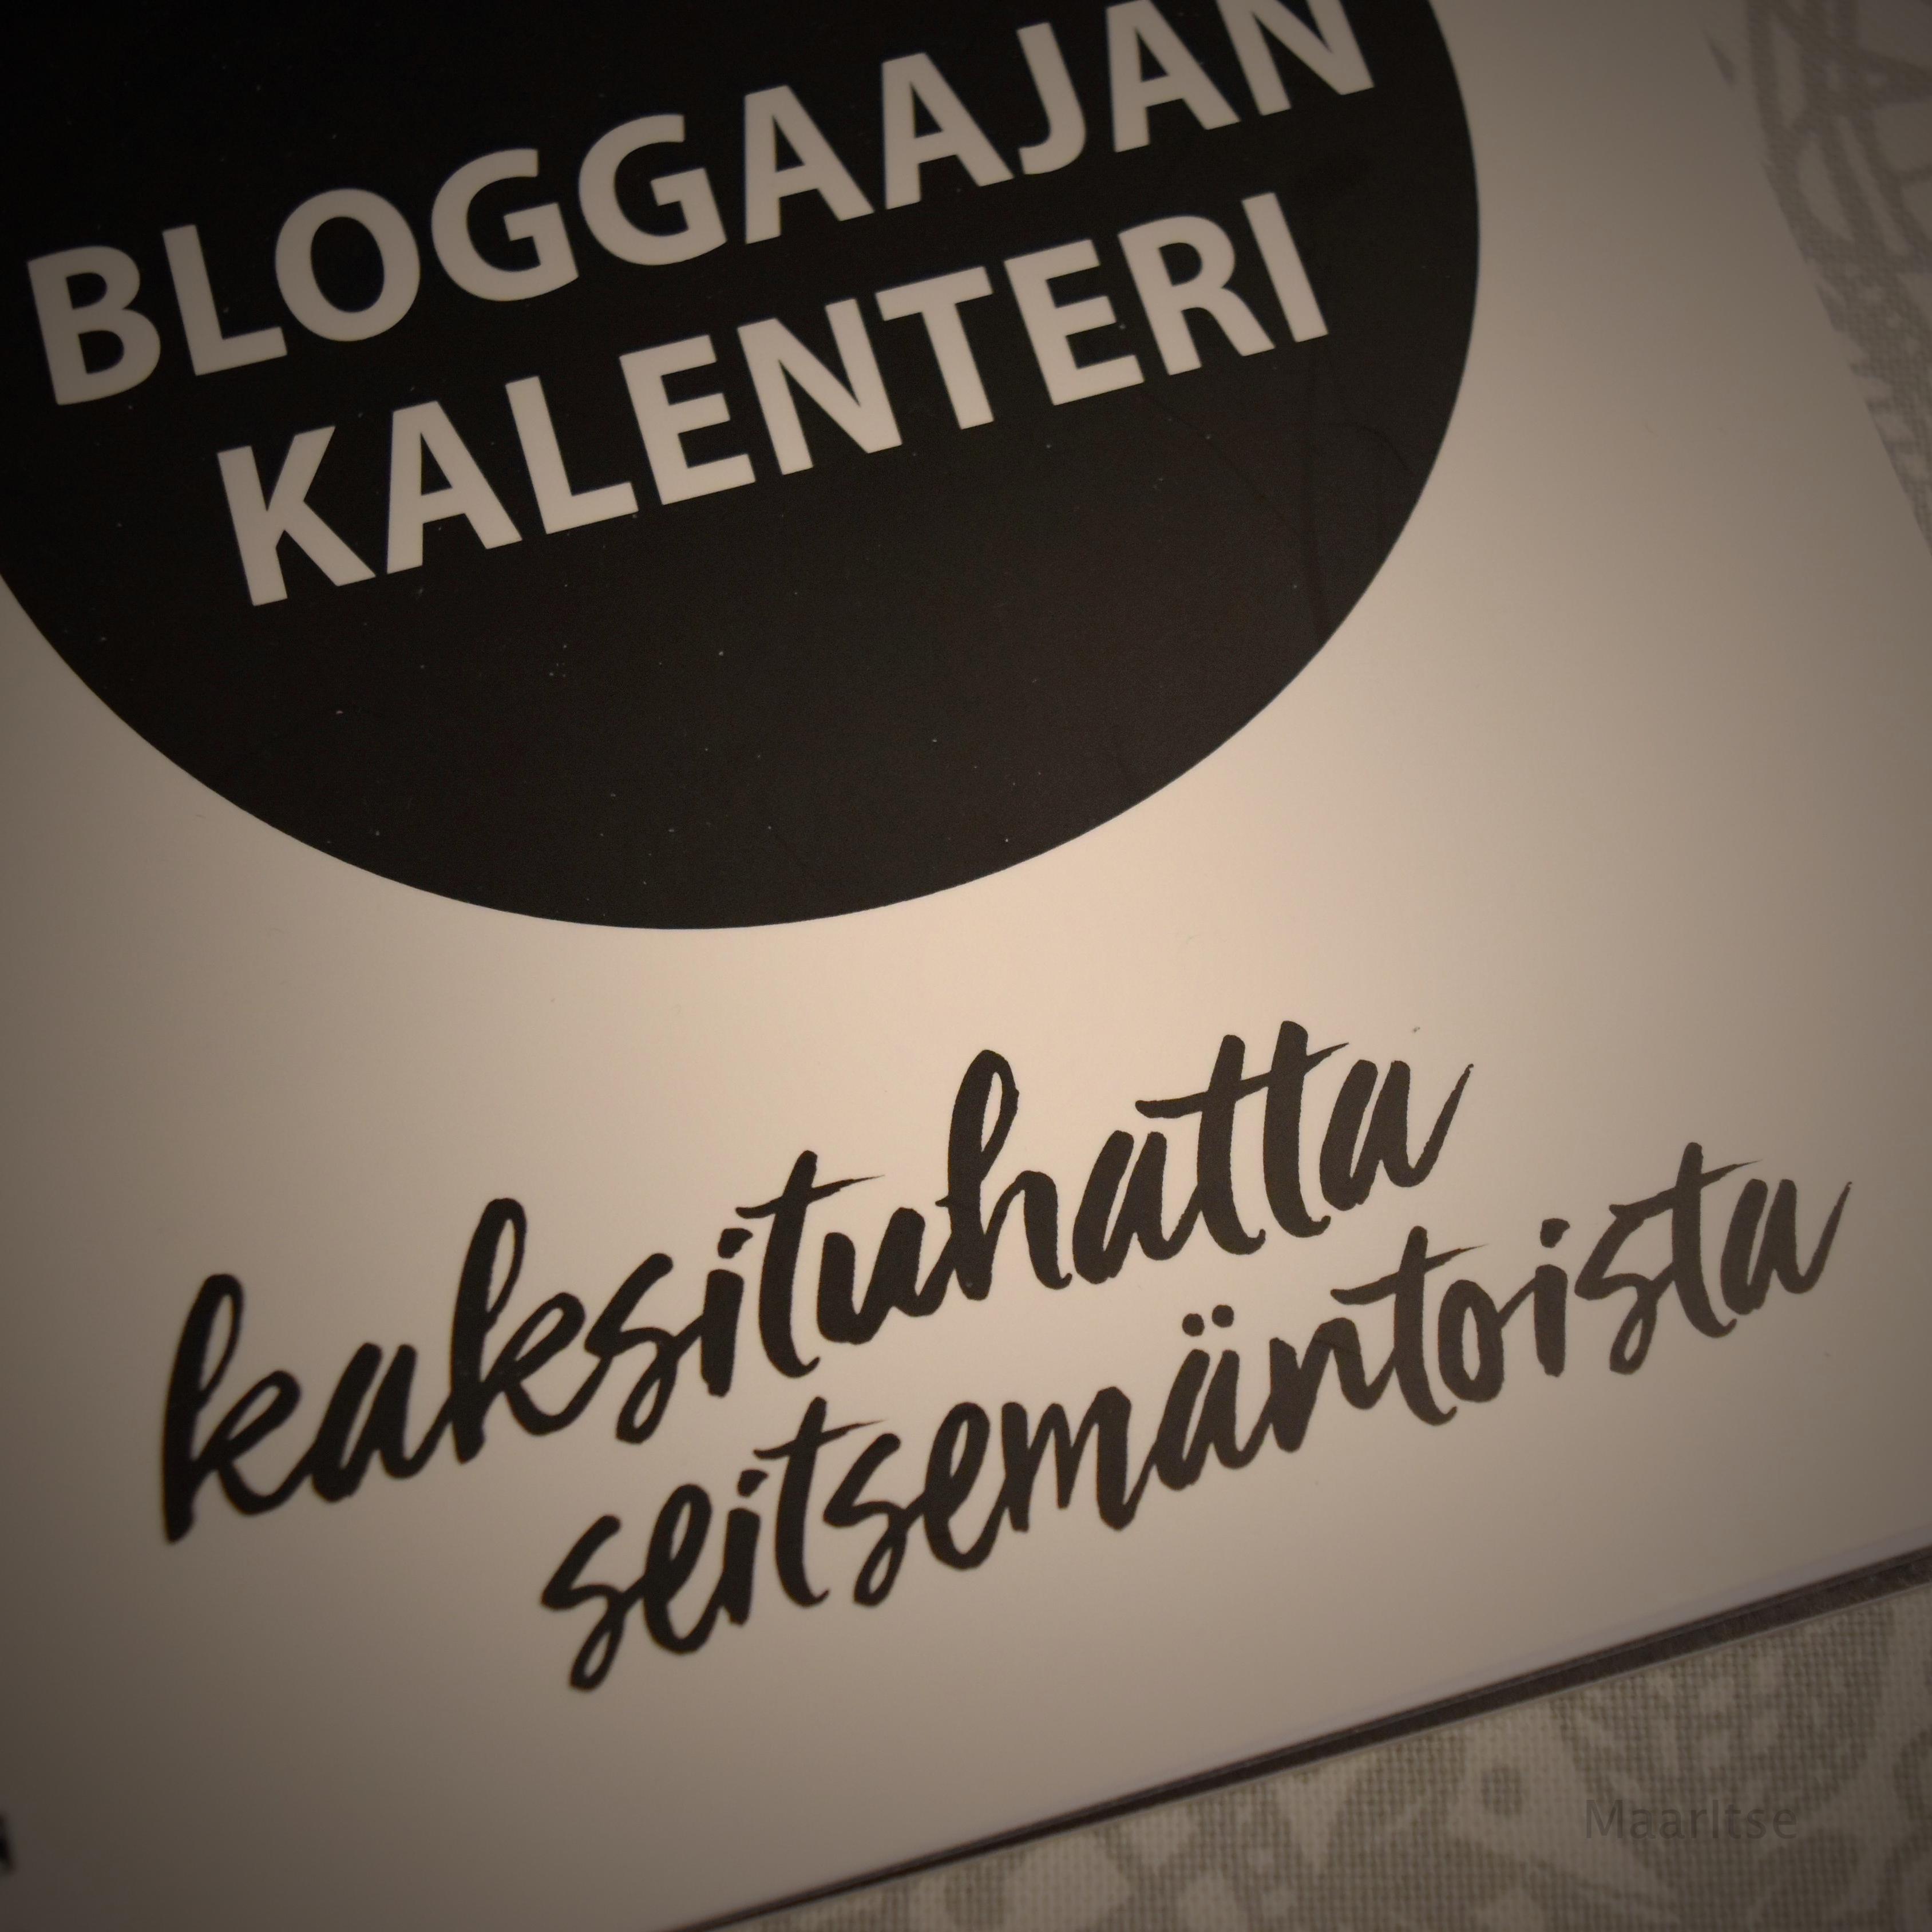 bloggaajankalenteri